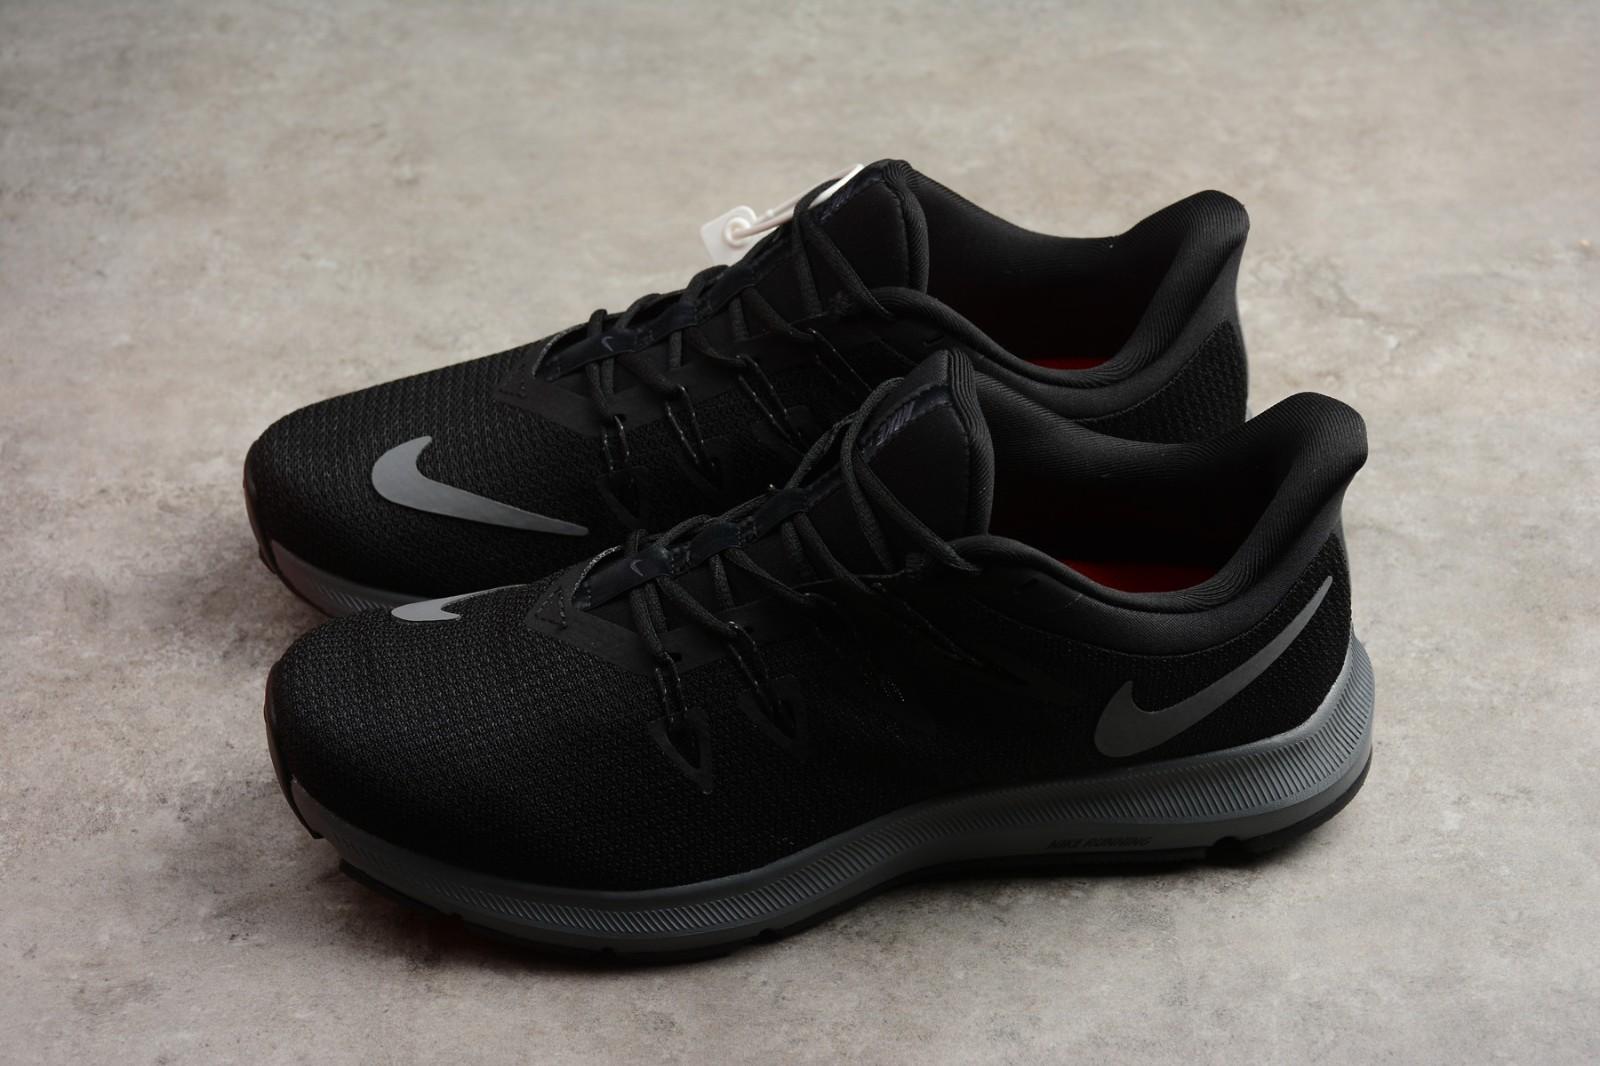 Kenia Lidiar con Clip mariposa  Mens Nike Quest 1.5 Black Anthracite Cool Grey AA7403 002 - Sepsale